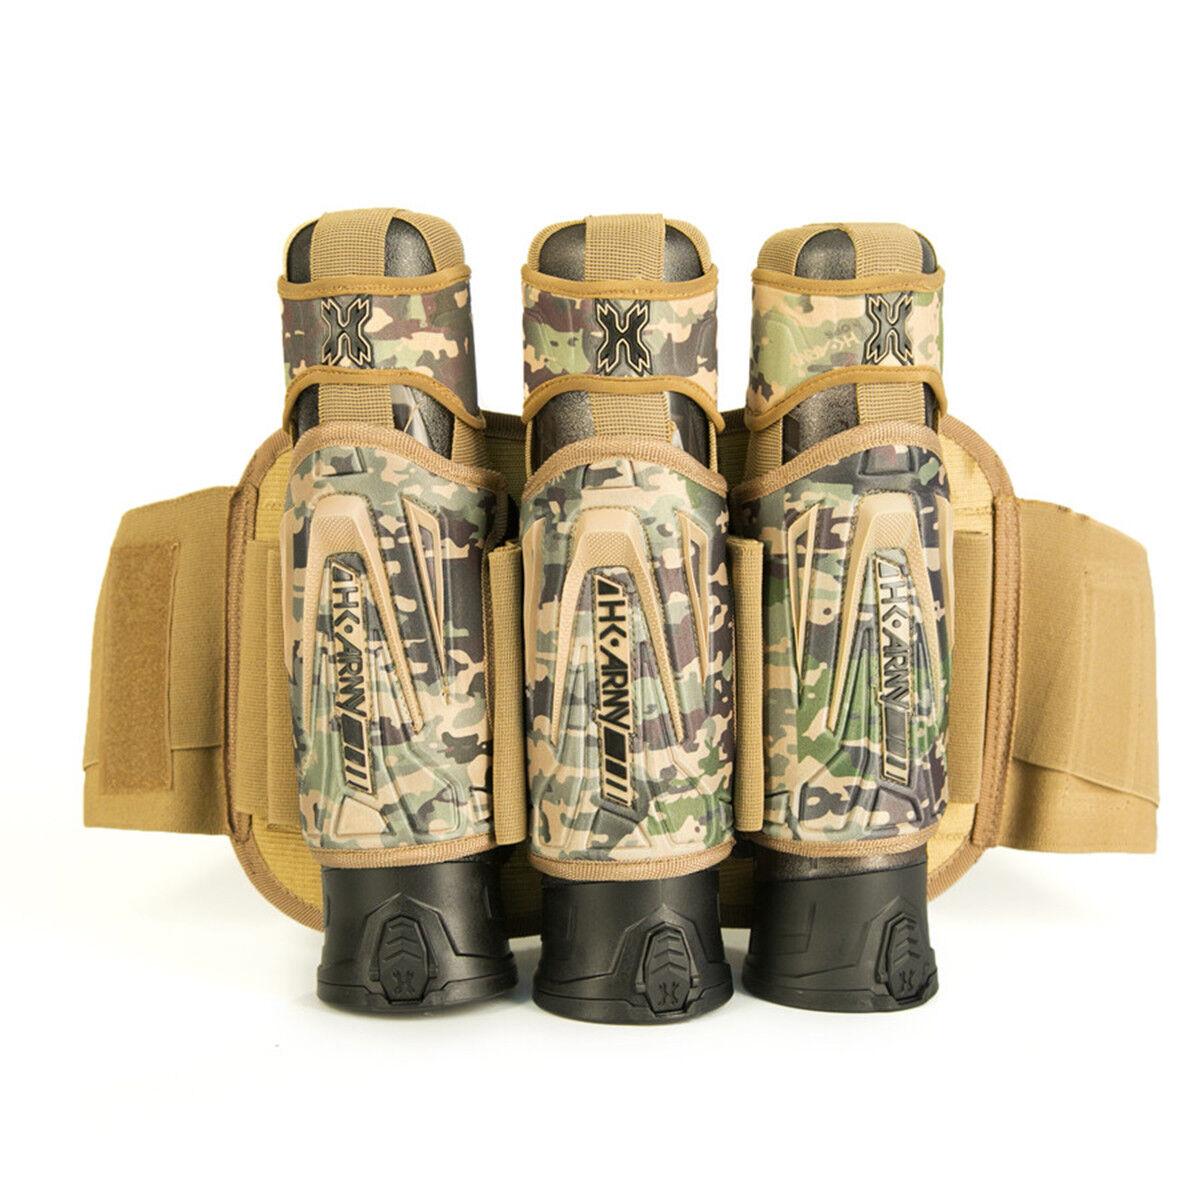 HK Army Zero-G Strapless Harness - HSTL CAM - 3+2 3+2 3+2 7cad3e